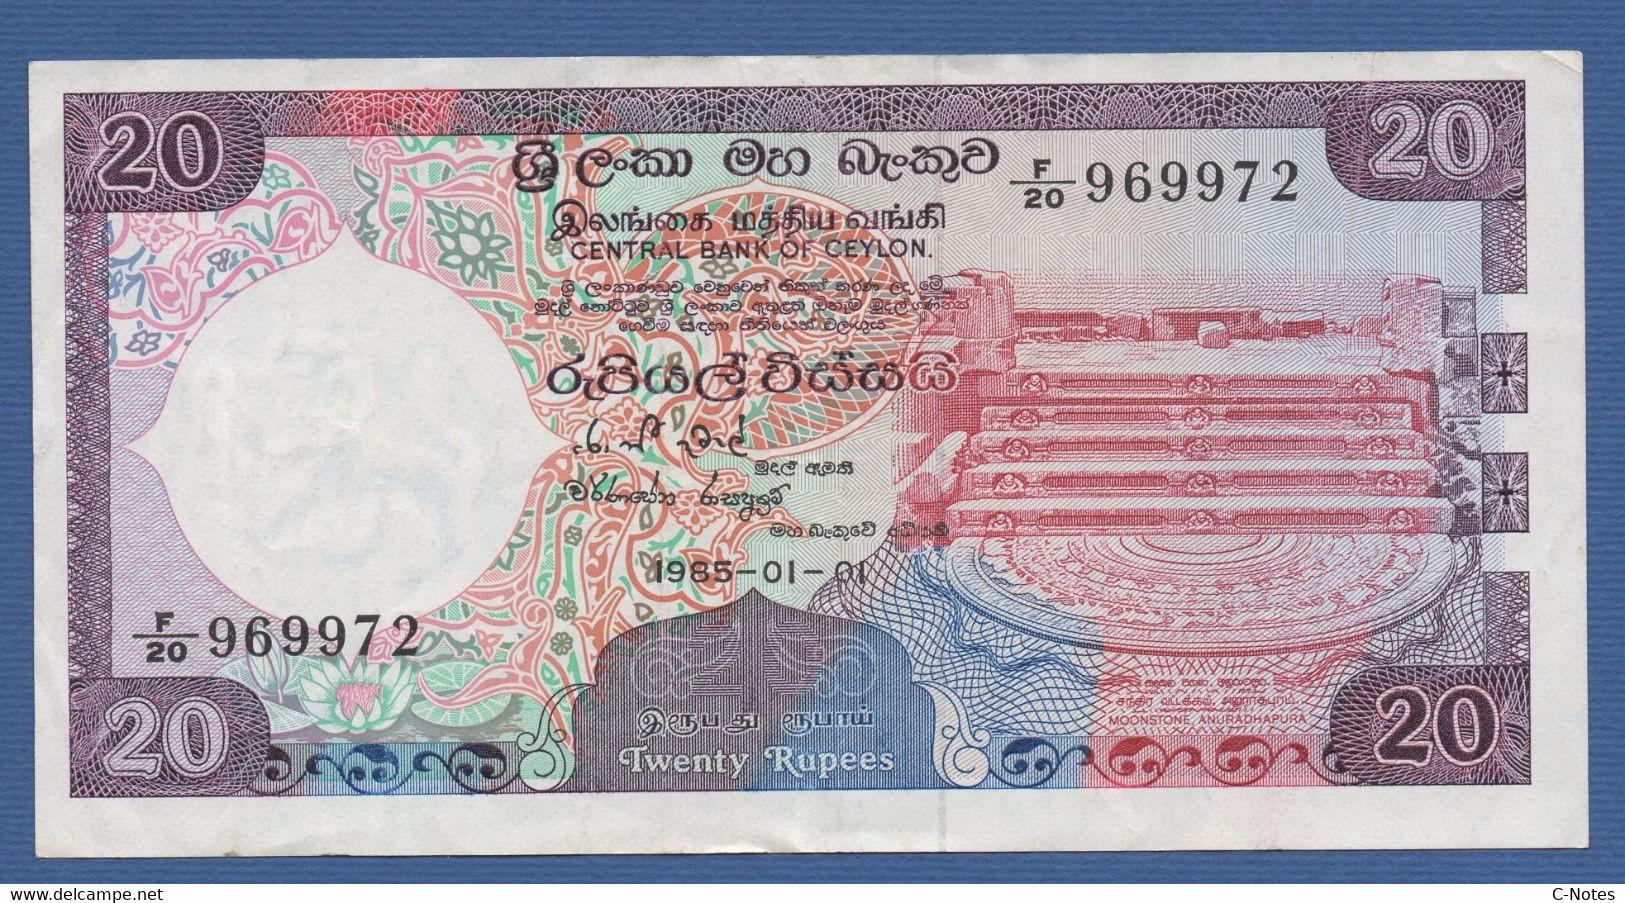 CEYLON & SRI LANKA - Central Bank Of Ceylon - P.93b – 20 RUPEES 1985 VF+ Serie F/20 969972 - Sri Lanka